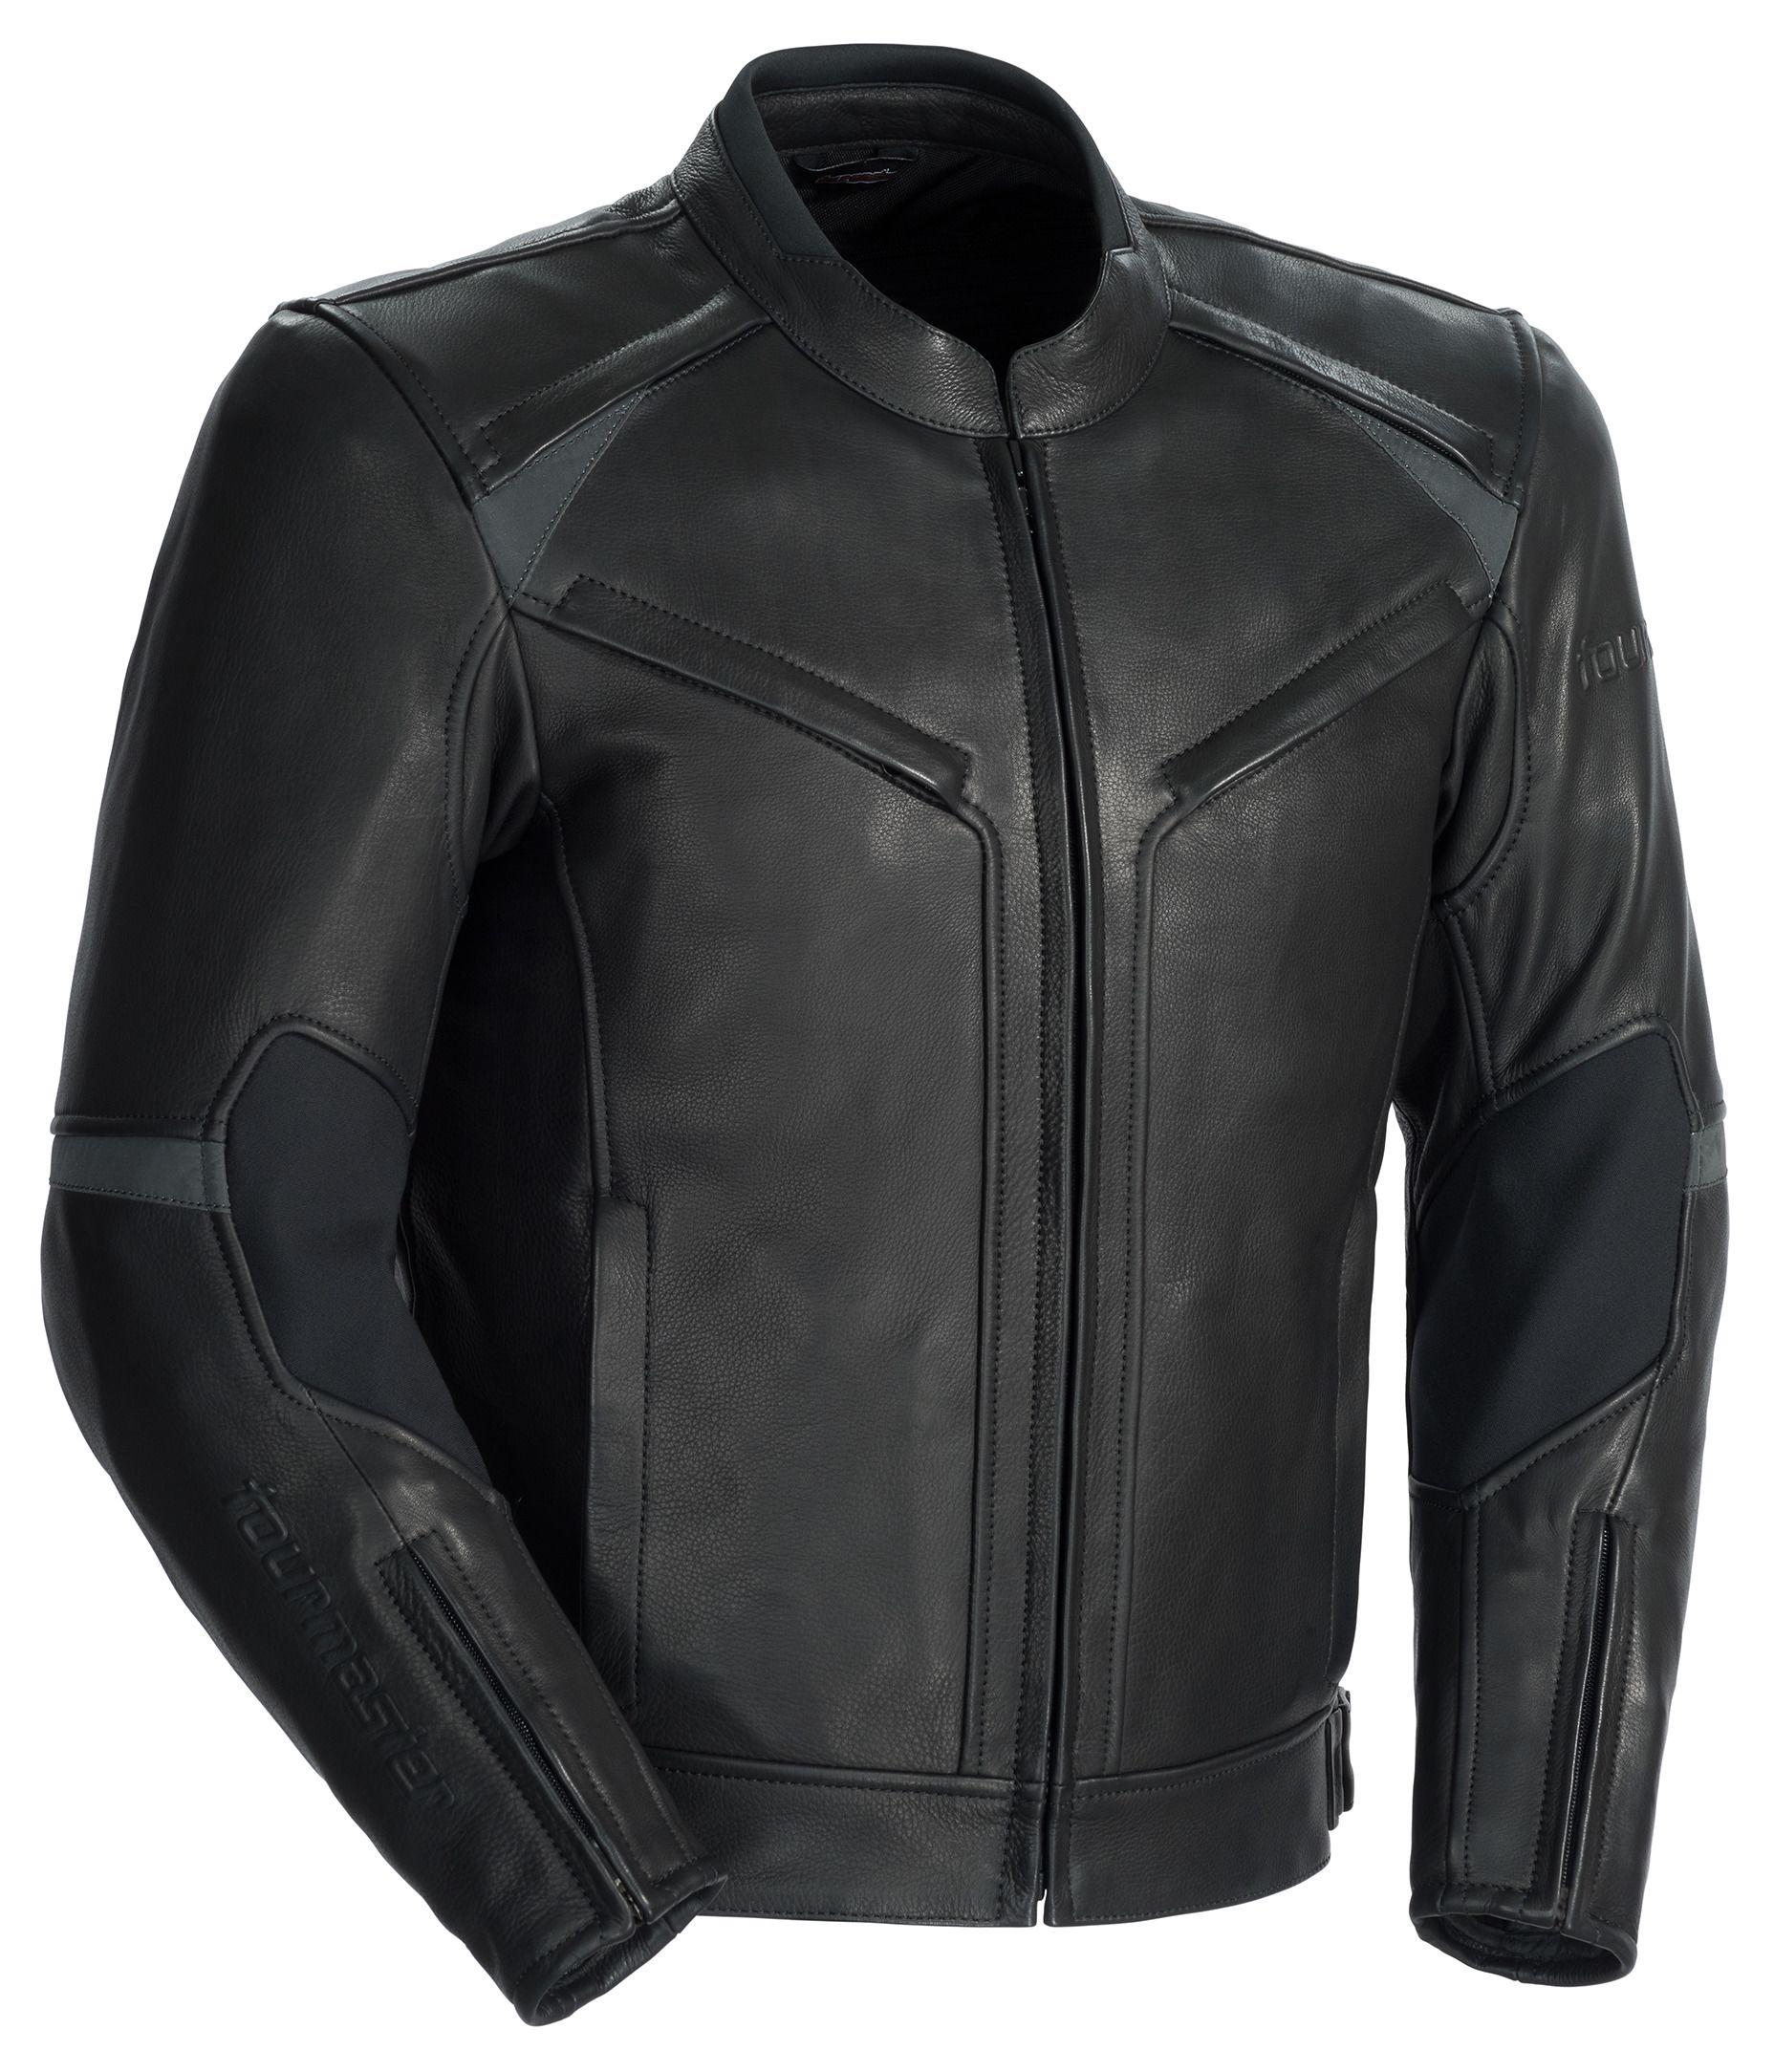 Leather jacket sale - Leather Jacket Sale 35